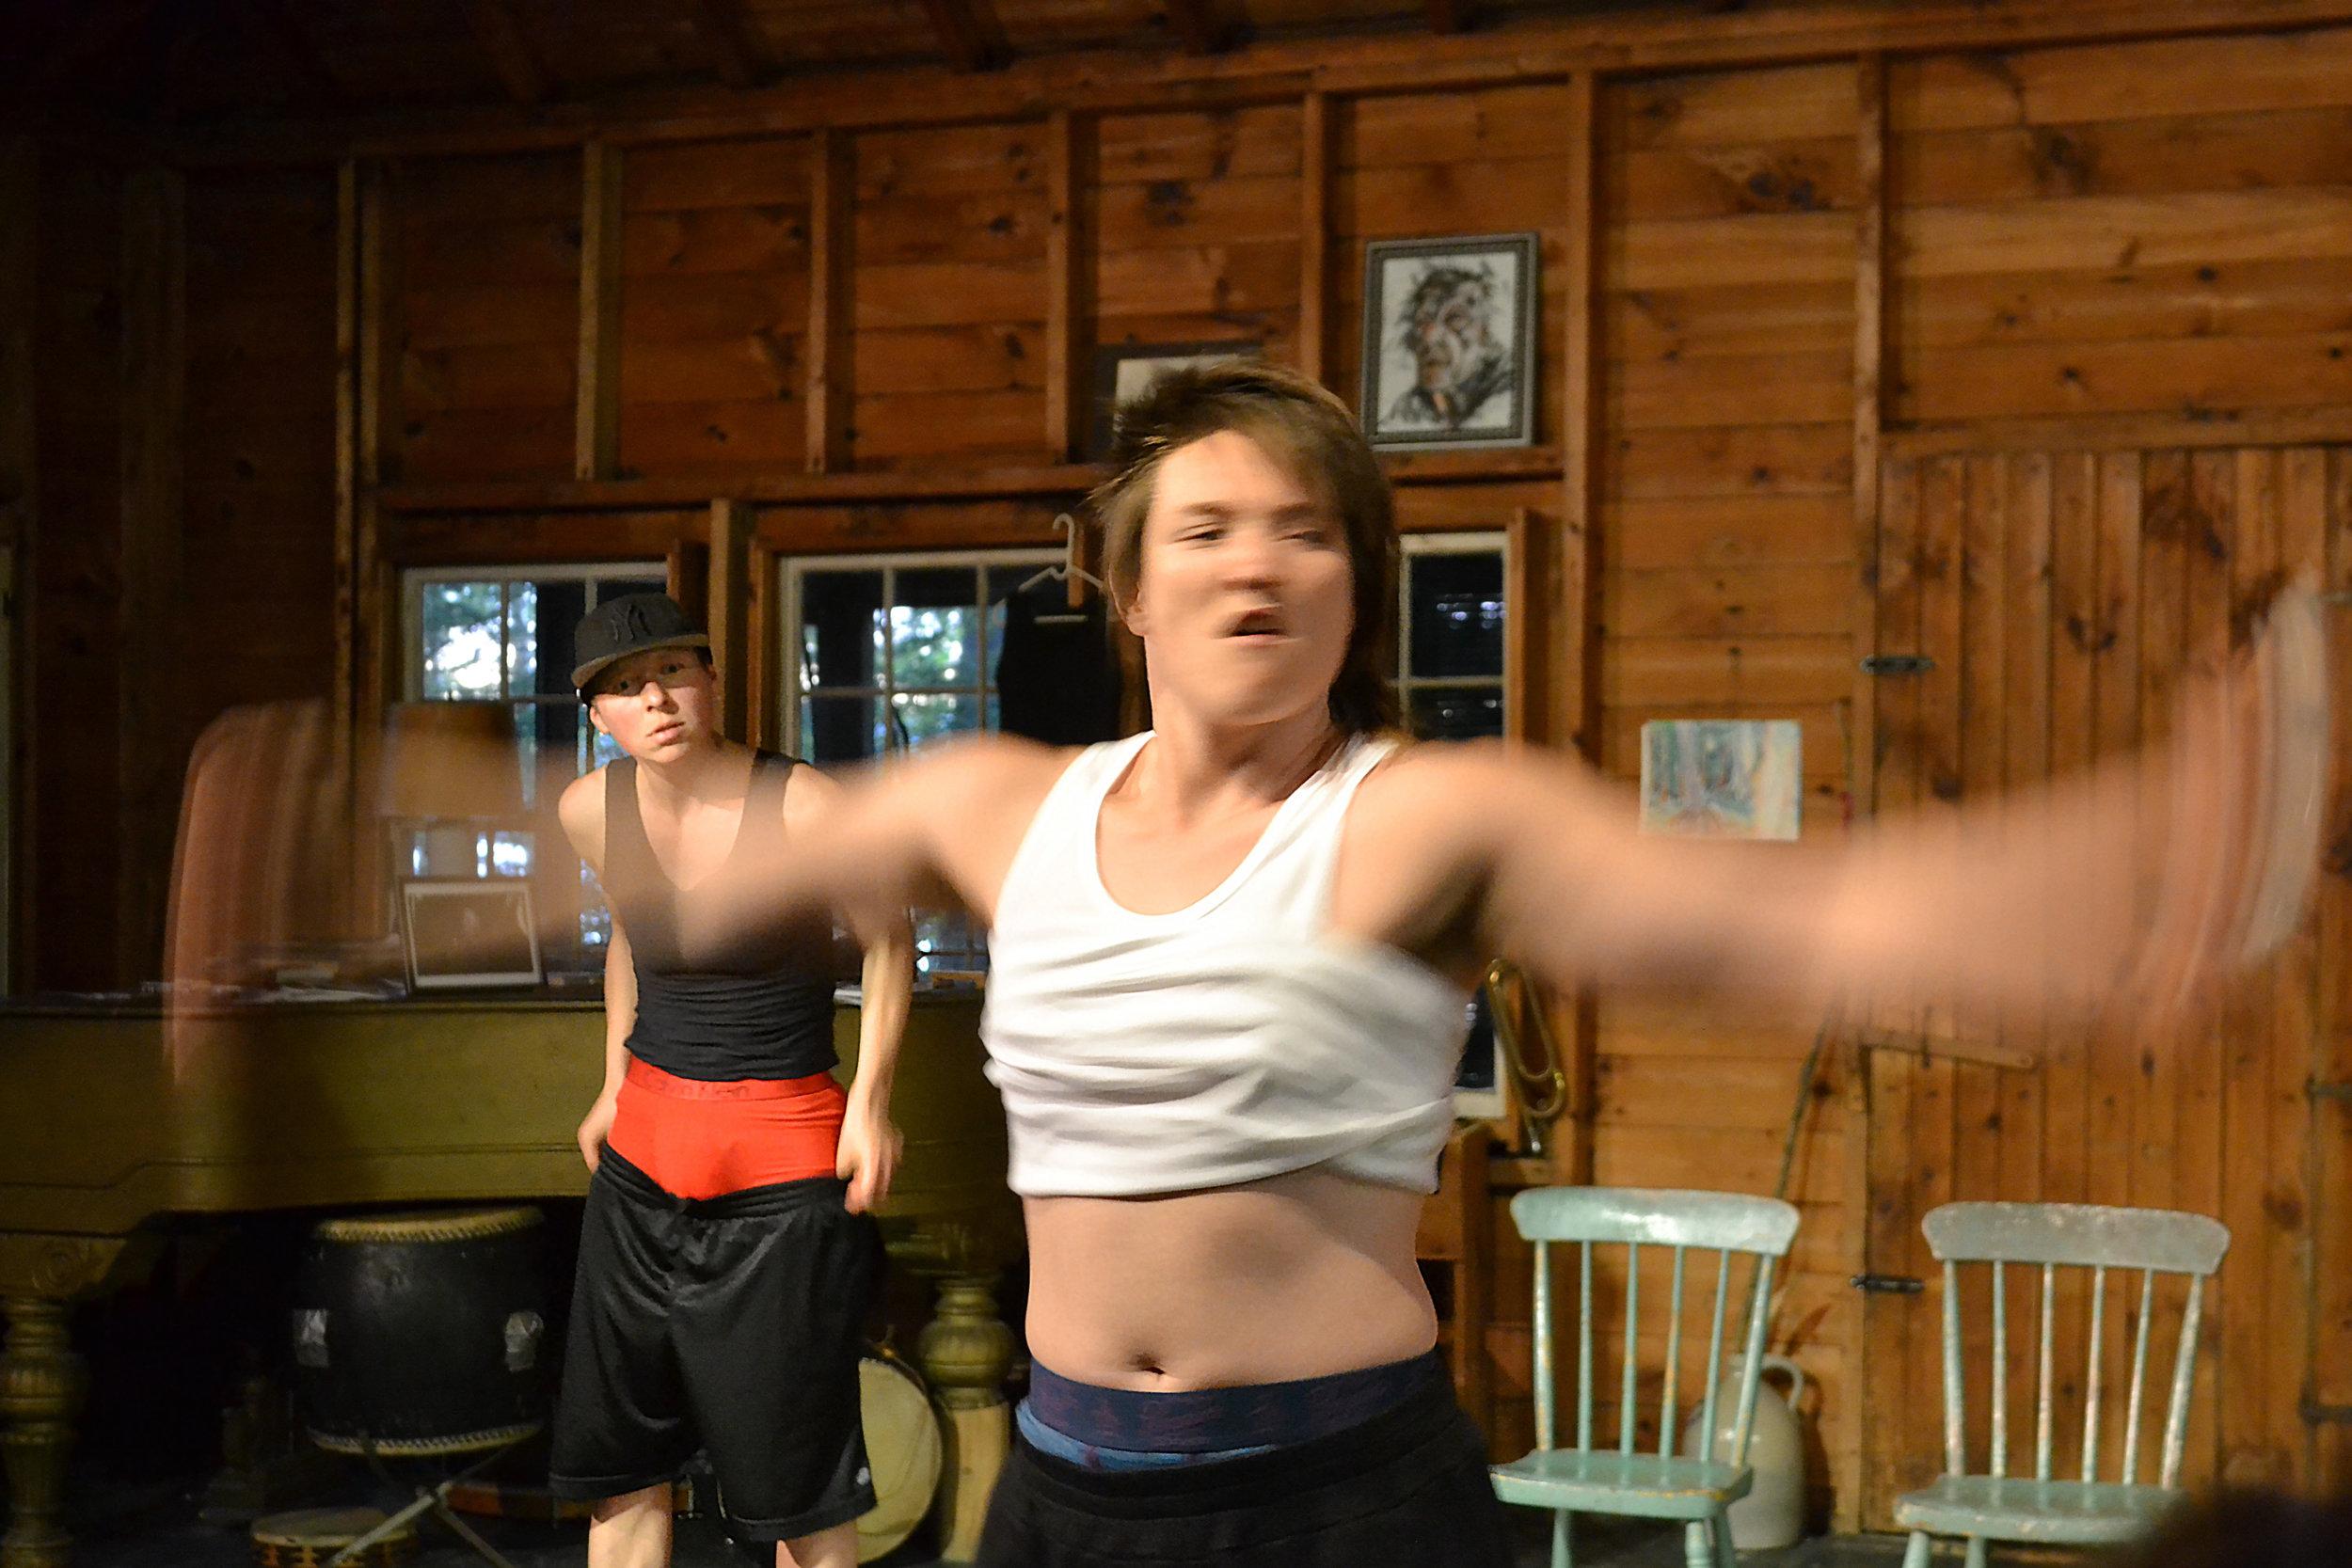 BroVogue, performance. July 2017, art residency, Bearnstow, Maine, USA